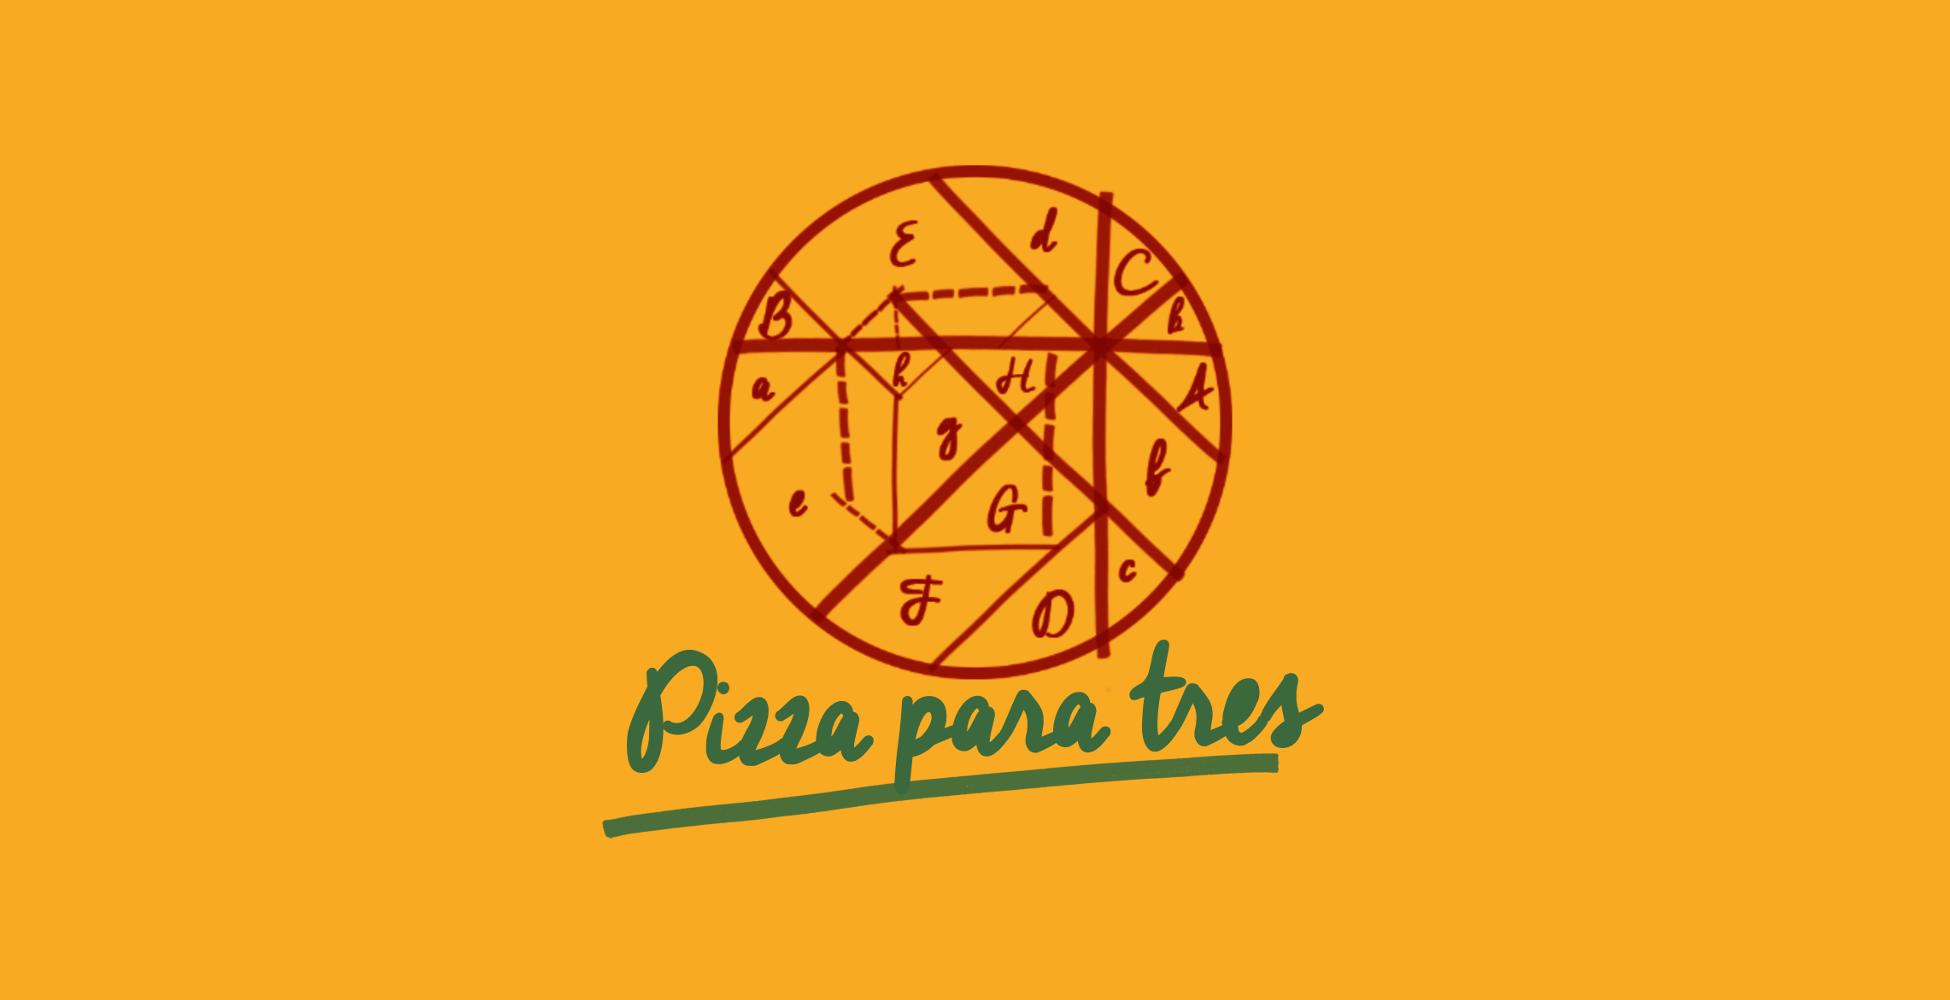 Pizza para tres Cover 2